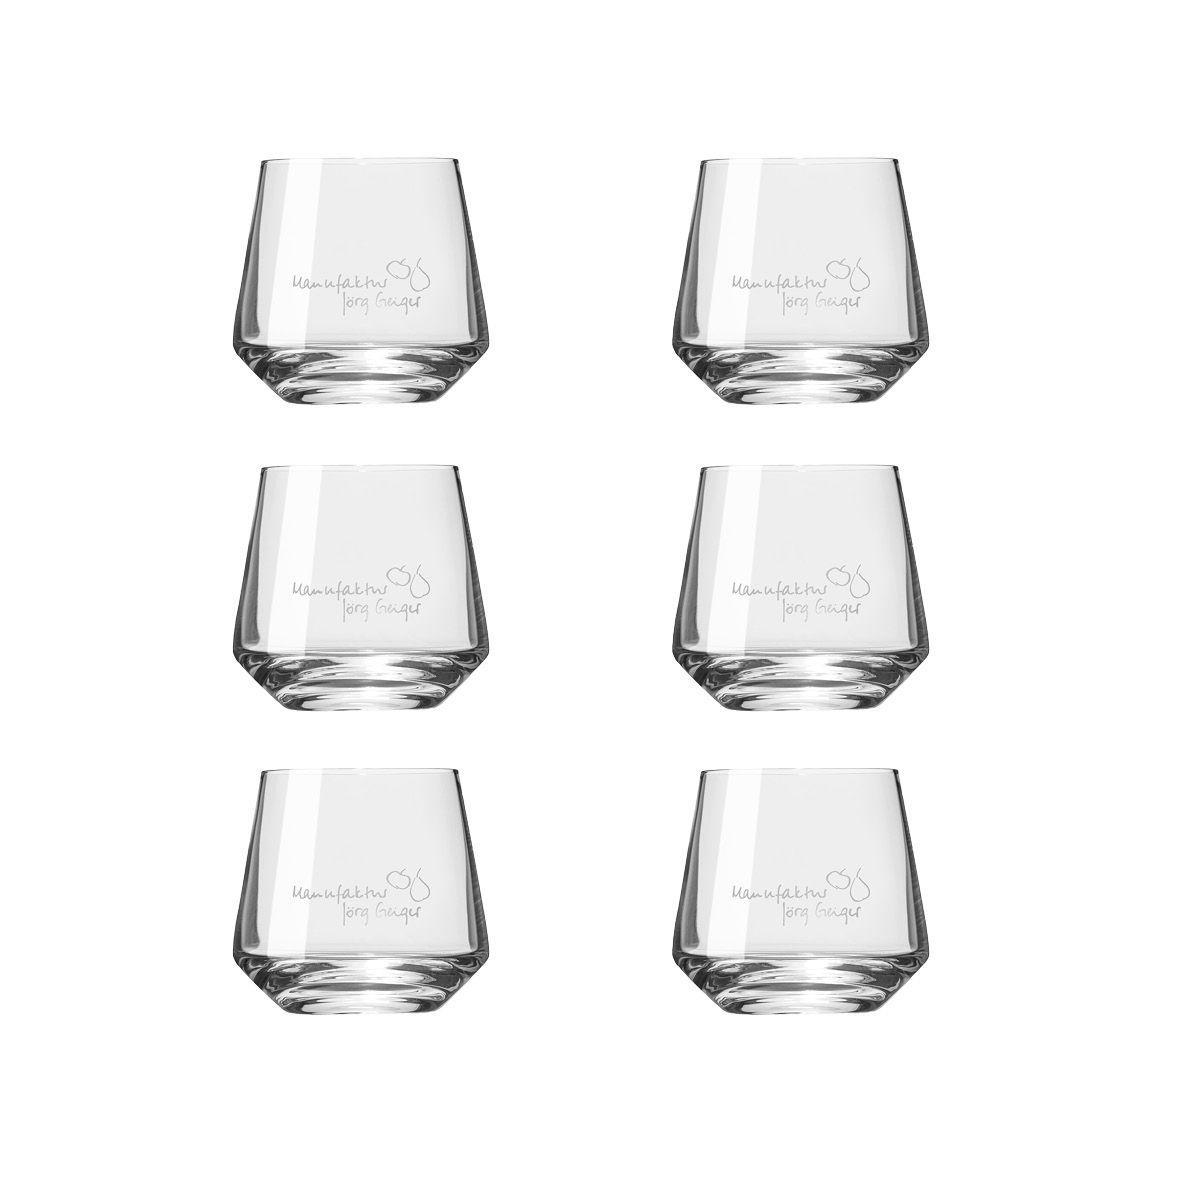 Whiskyglas exklusive Ausführung 6er Karton Zwiesel Whiskyglas mit Logo im 6er Bundle